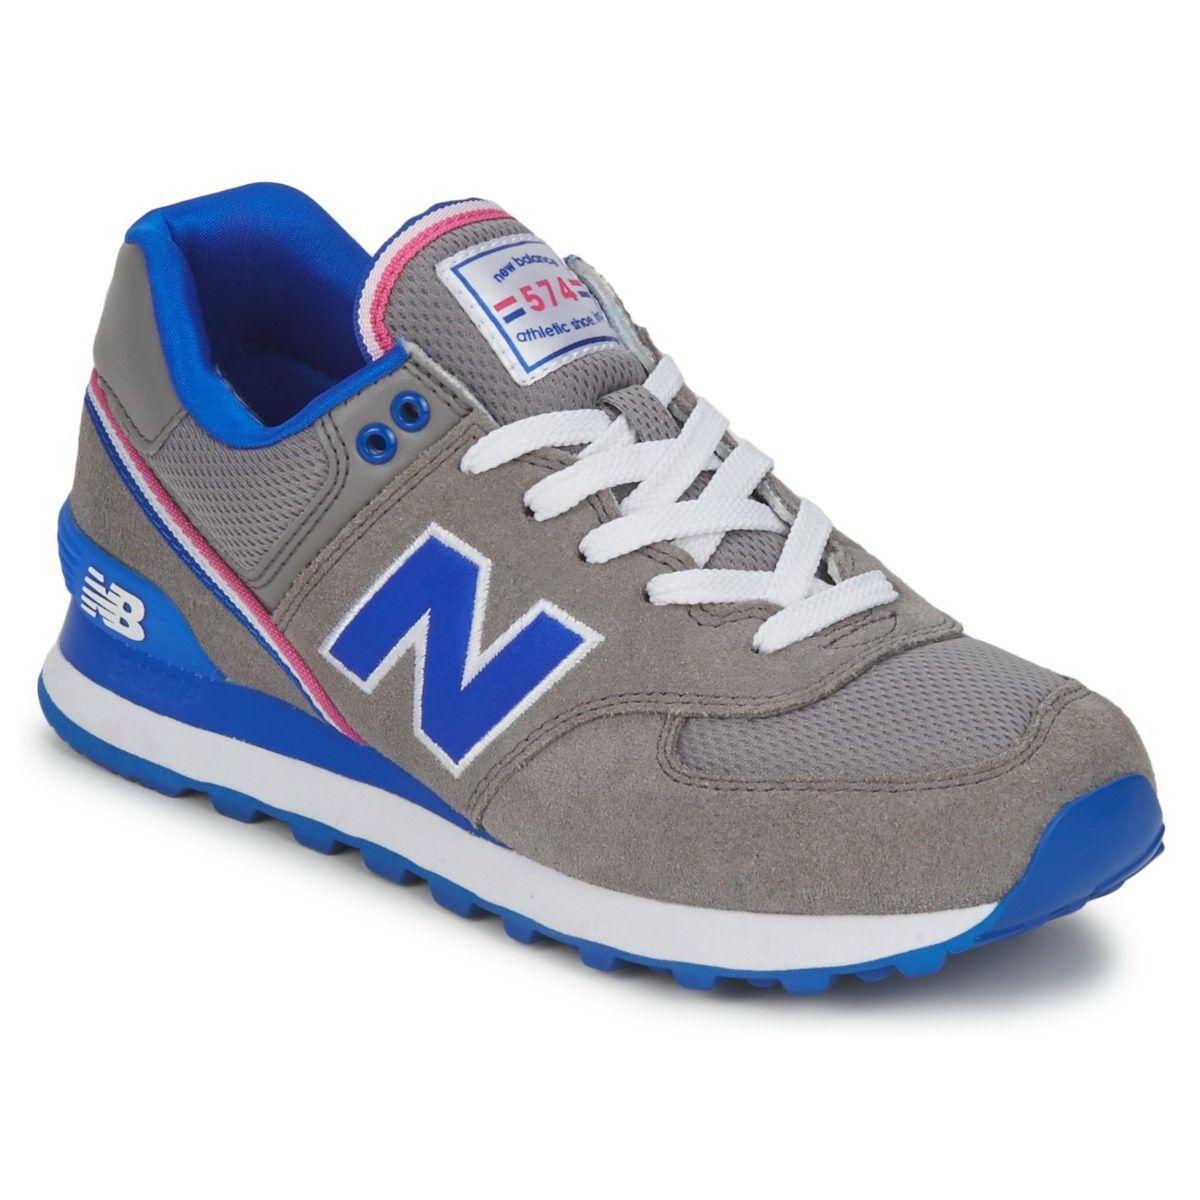 New Balance 574 Women's Grey Blue Wl574   New Balance 574